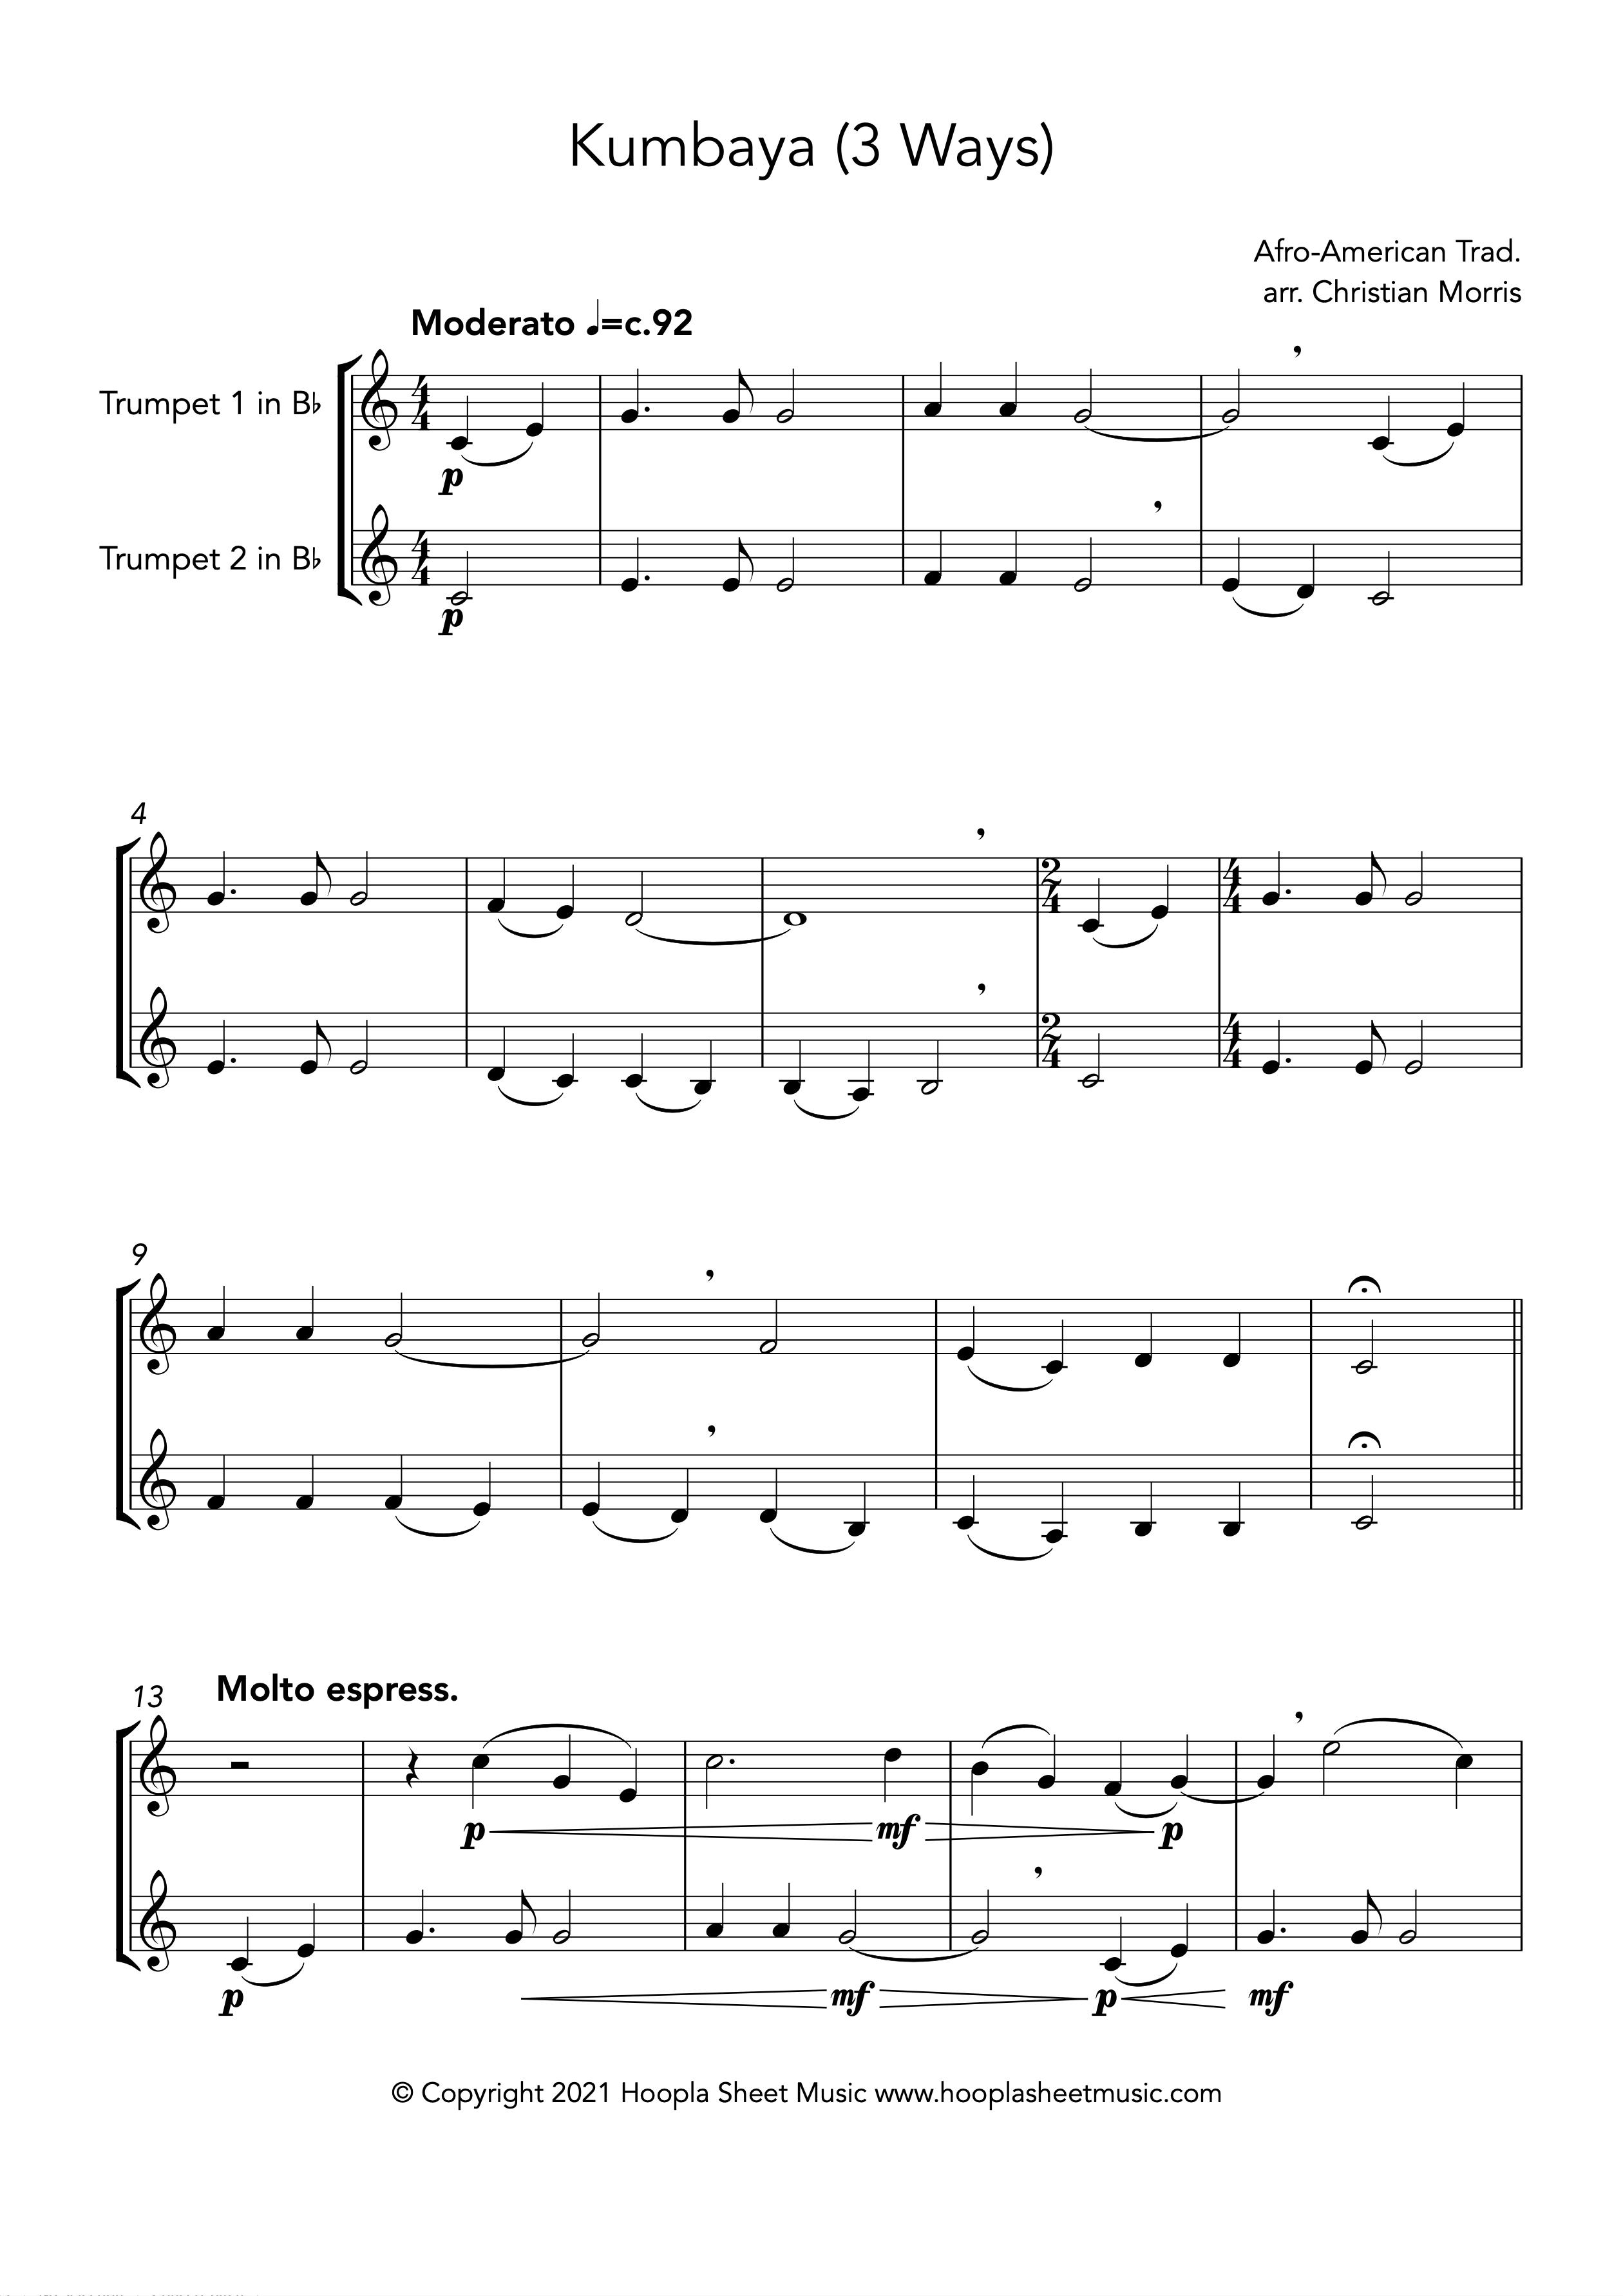 Kumbaya (Trumpet Duet)